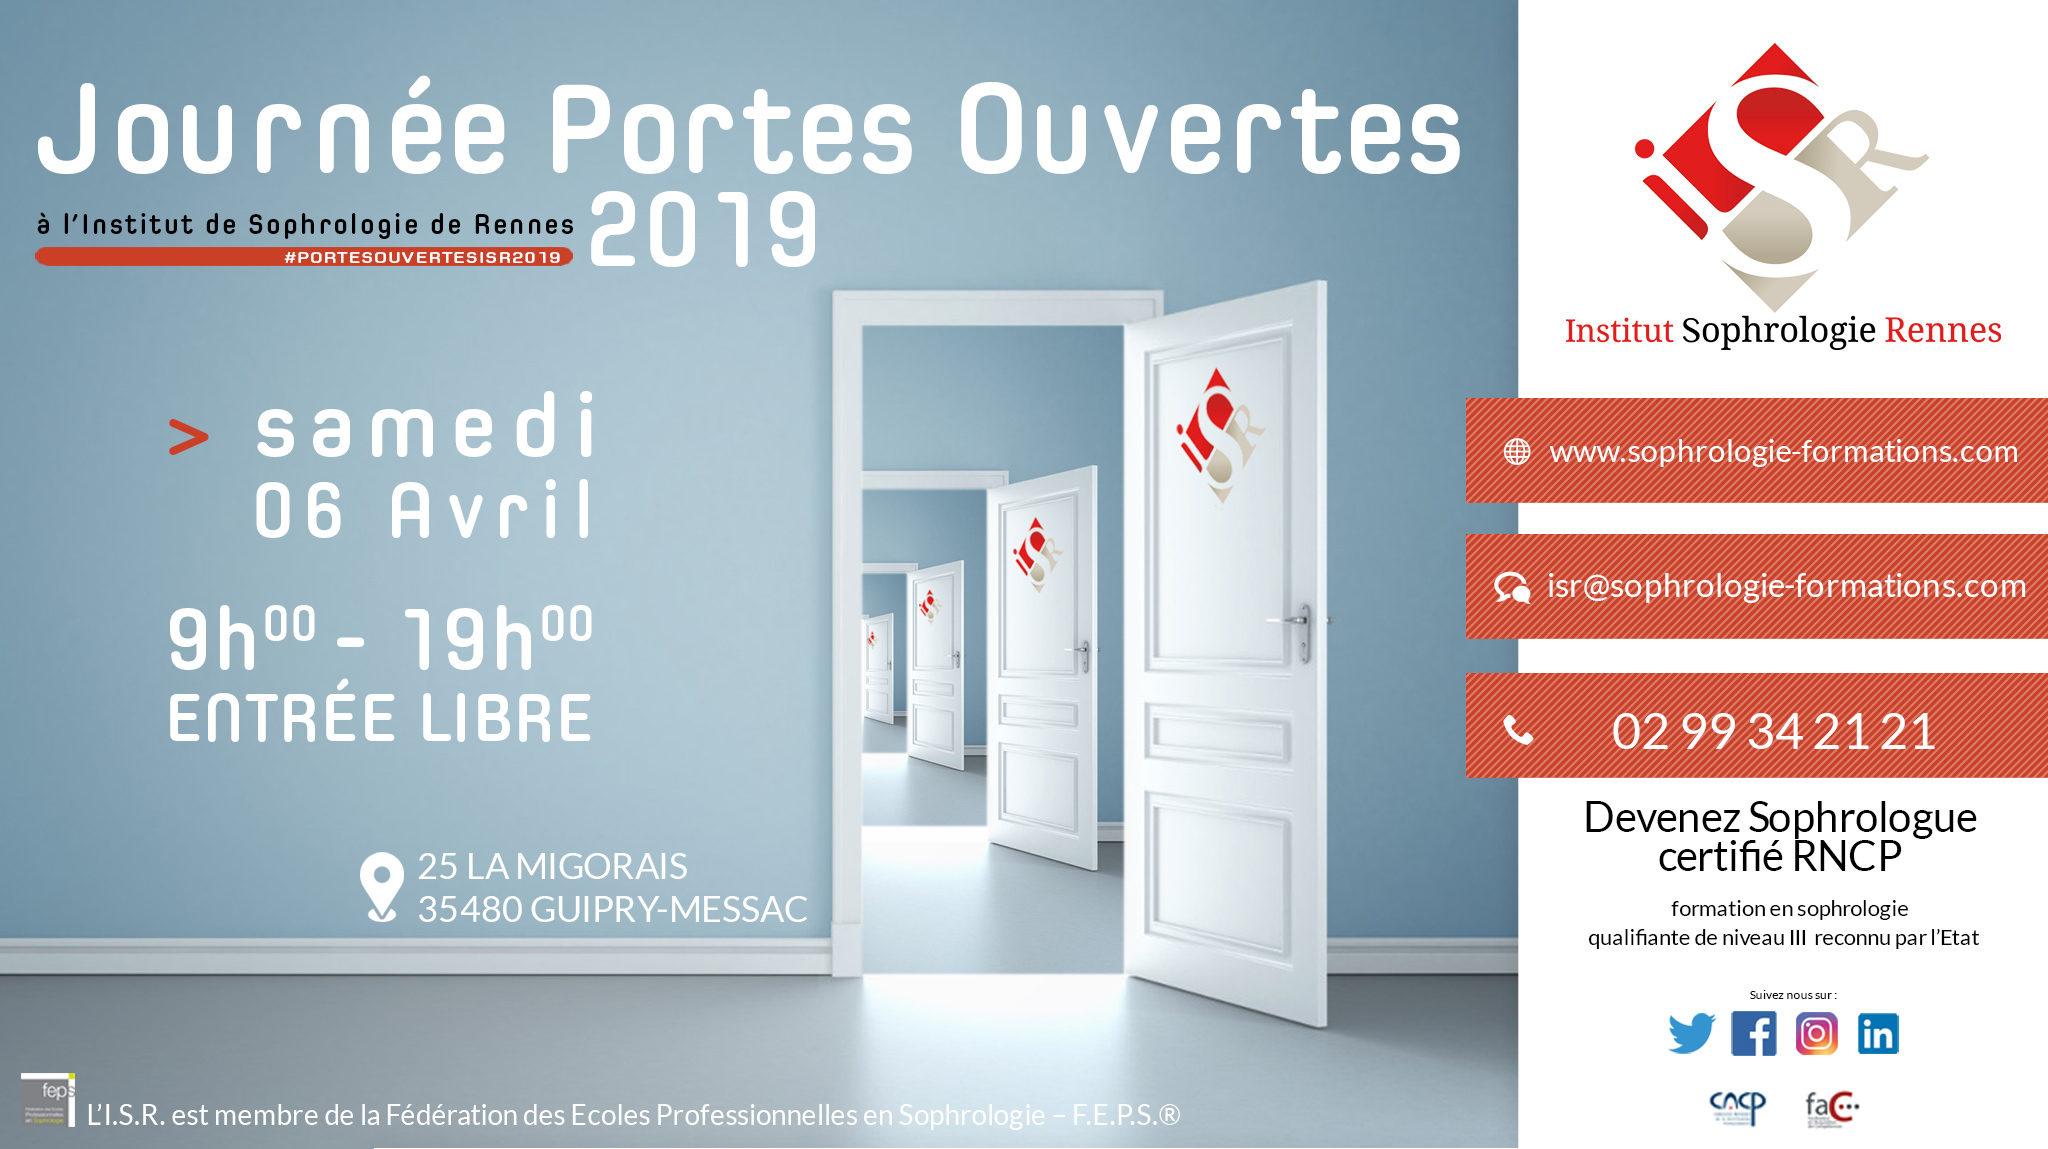 Portes ouvertes 2019